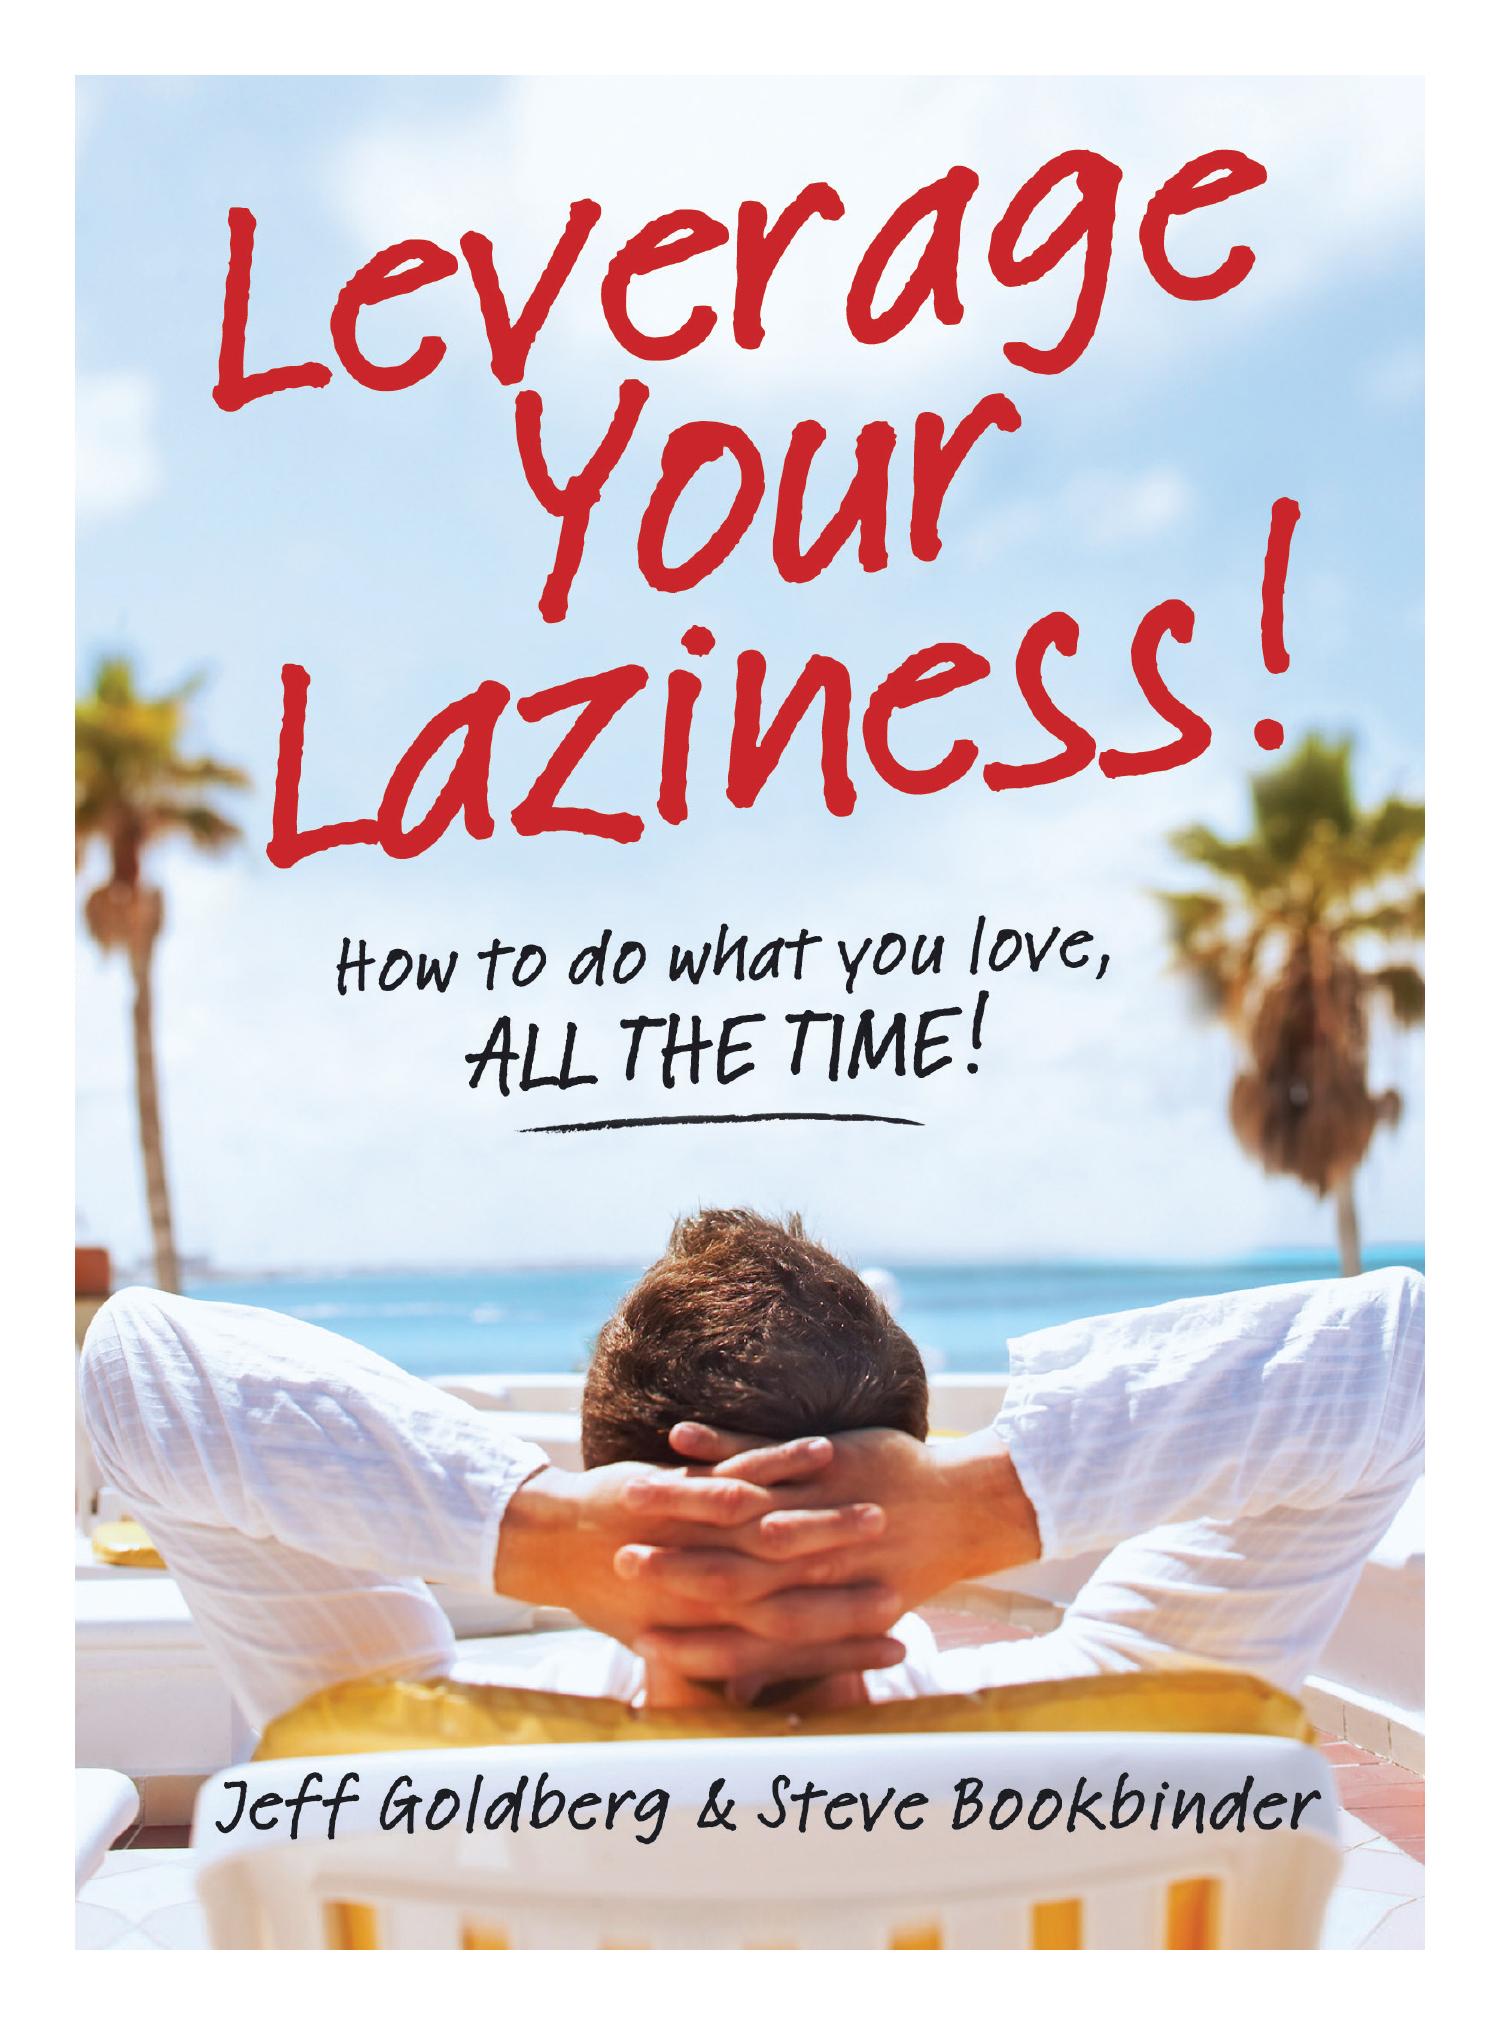 Leverage_Your_Laziness.jpg